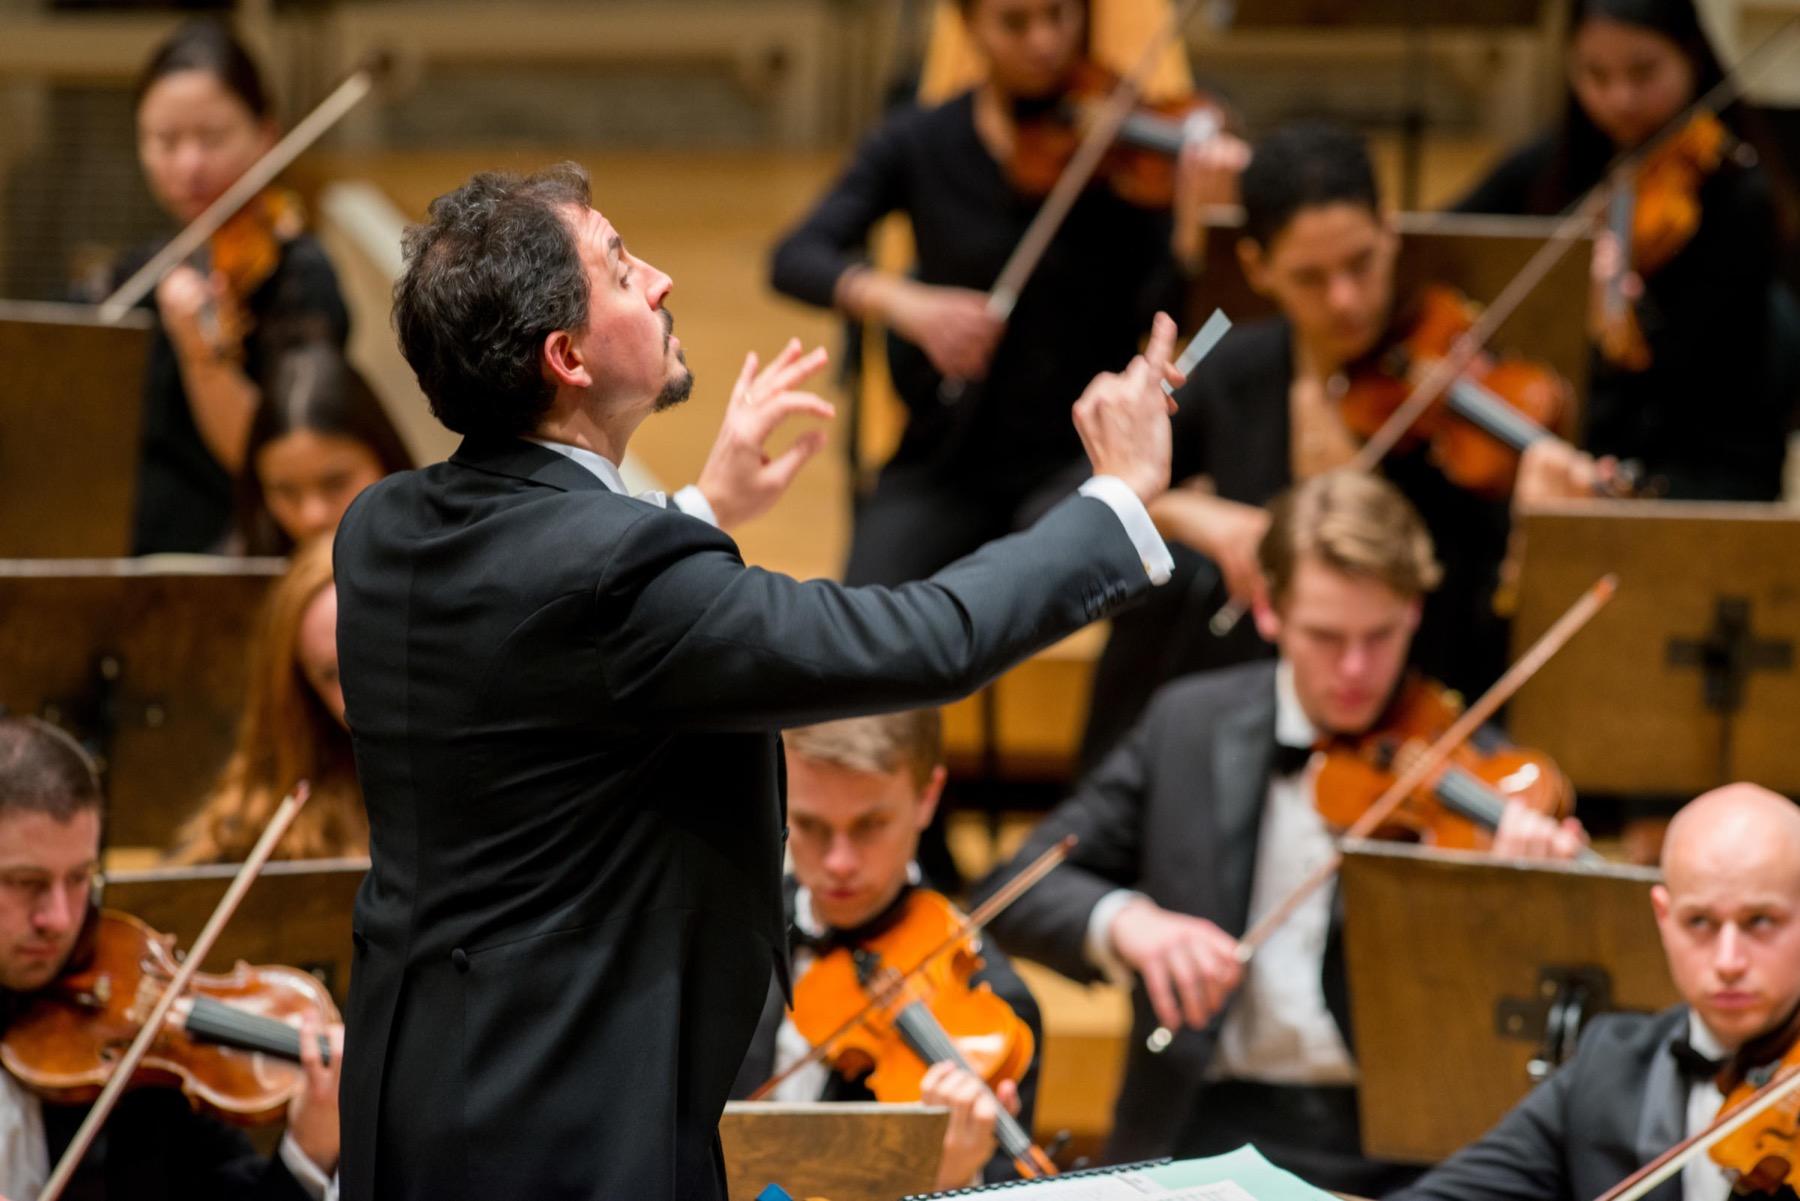 Symphony – Andrizzi conducting 2018